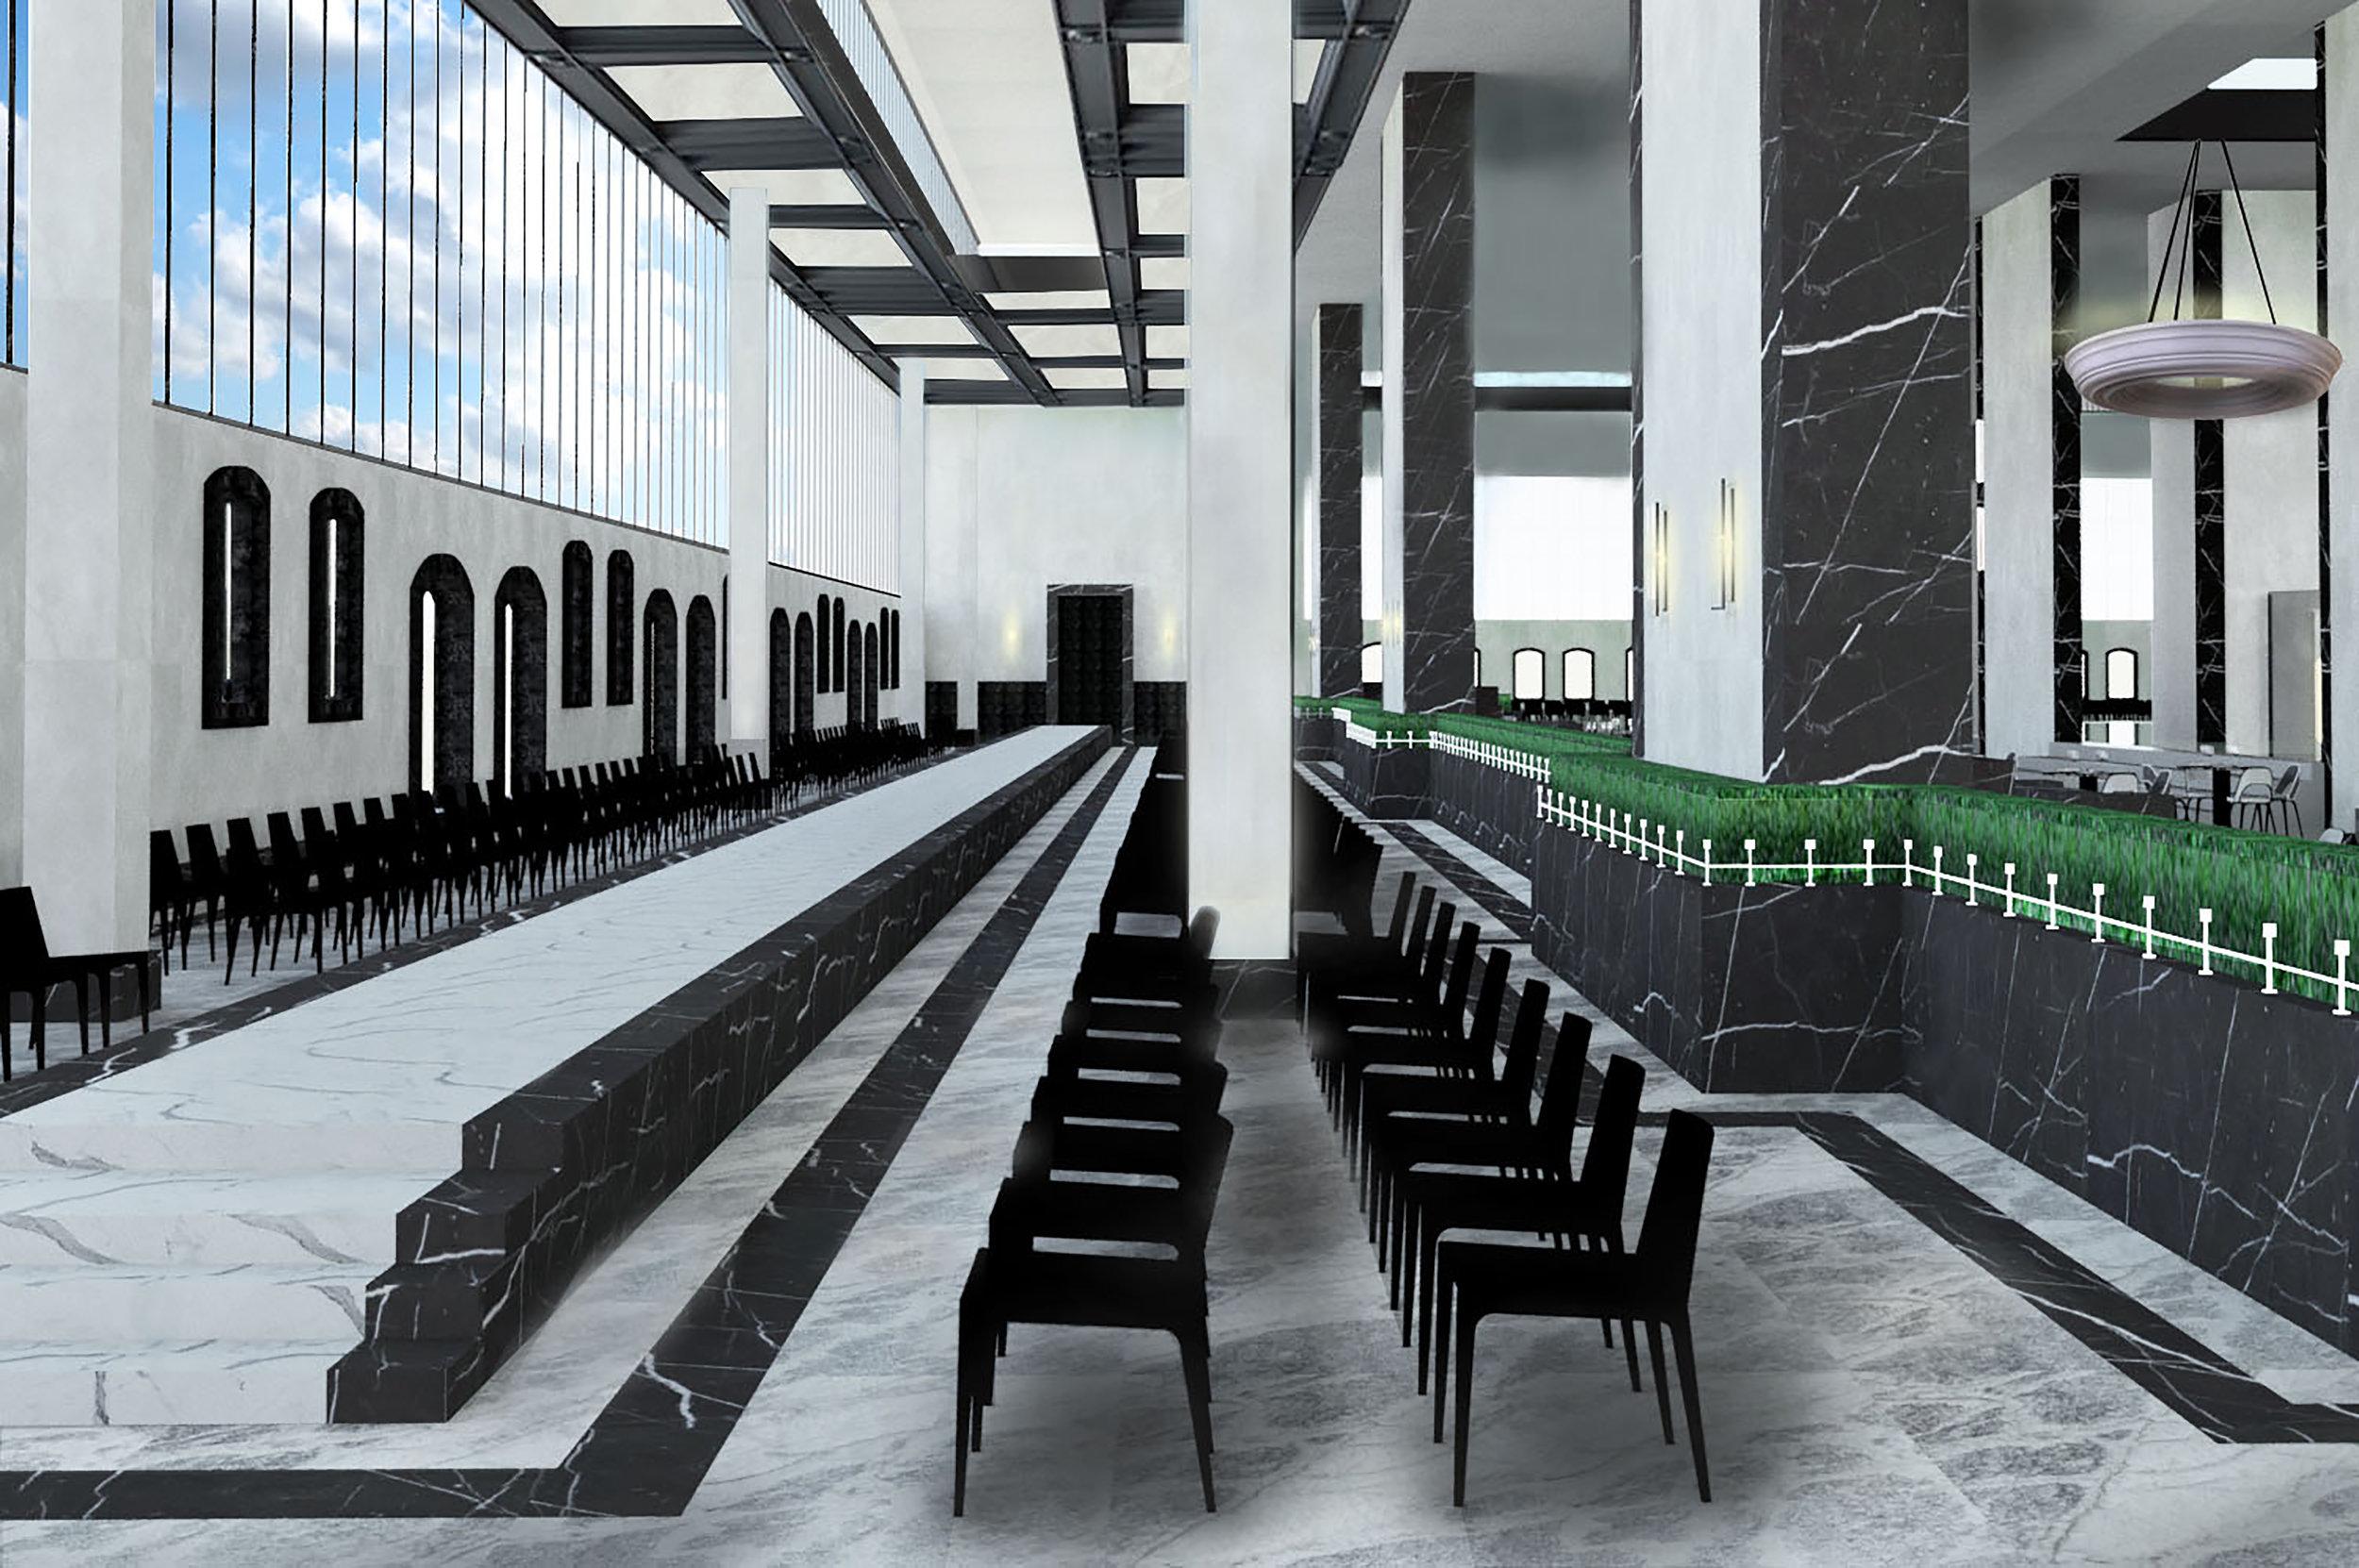 garrett-carter-new-york-fashion-week-event-center-the-bond_34751024400_o.jpg